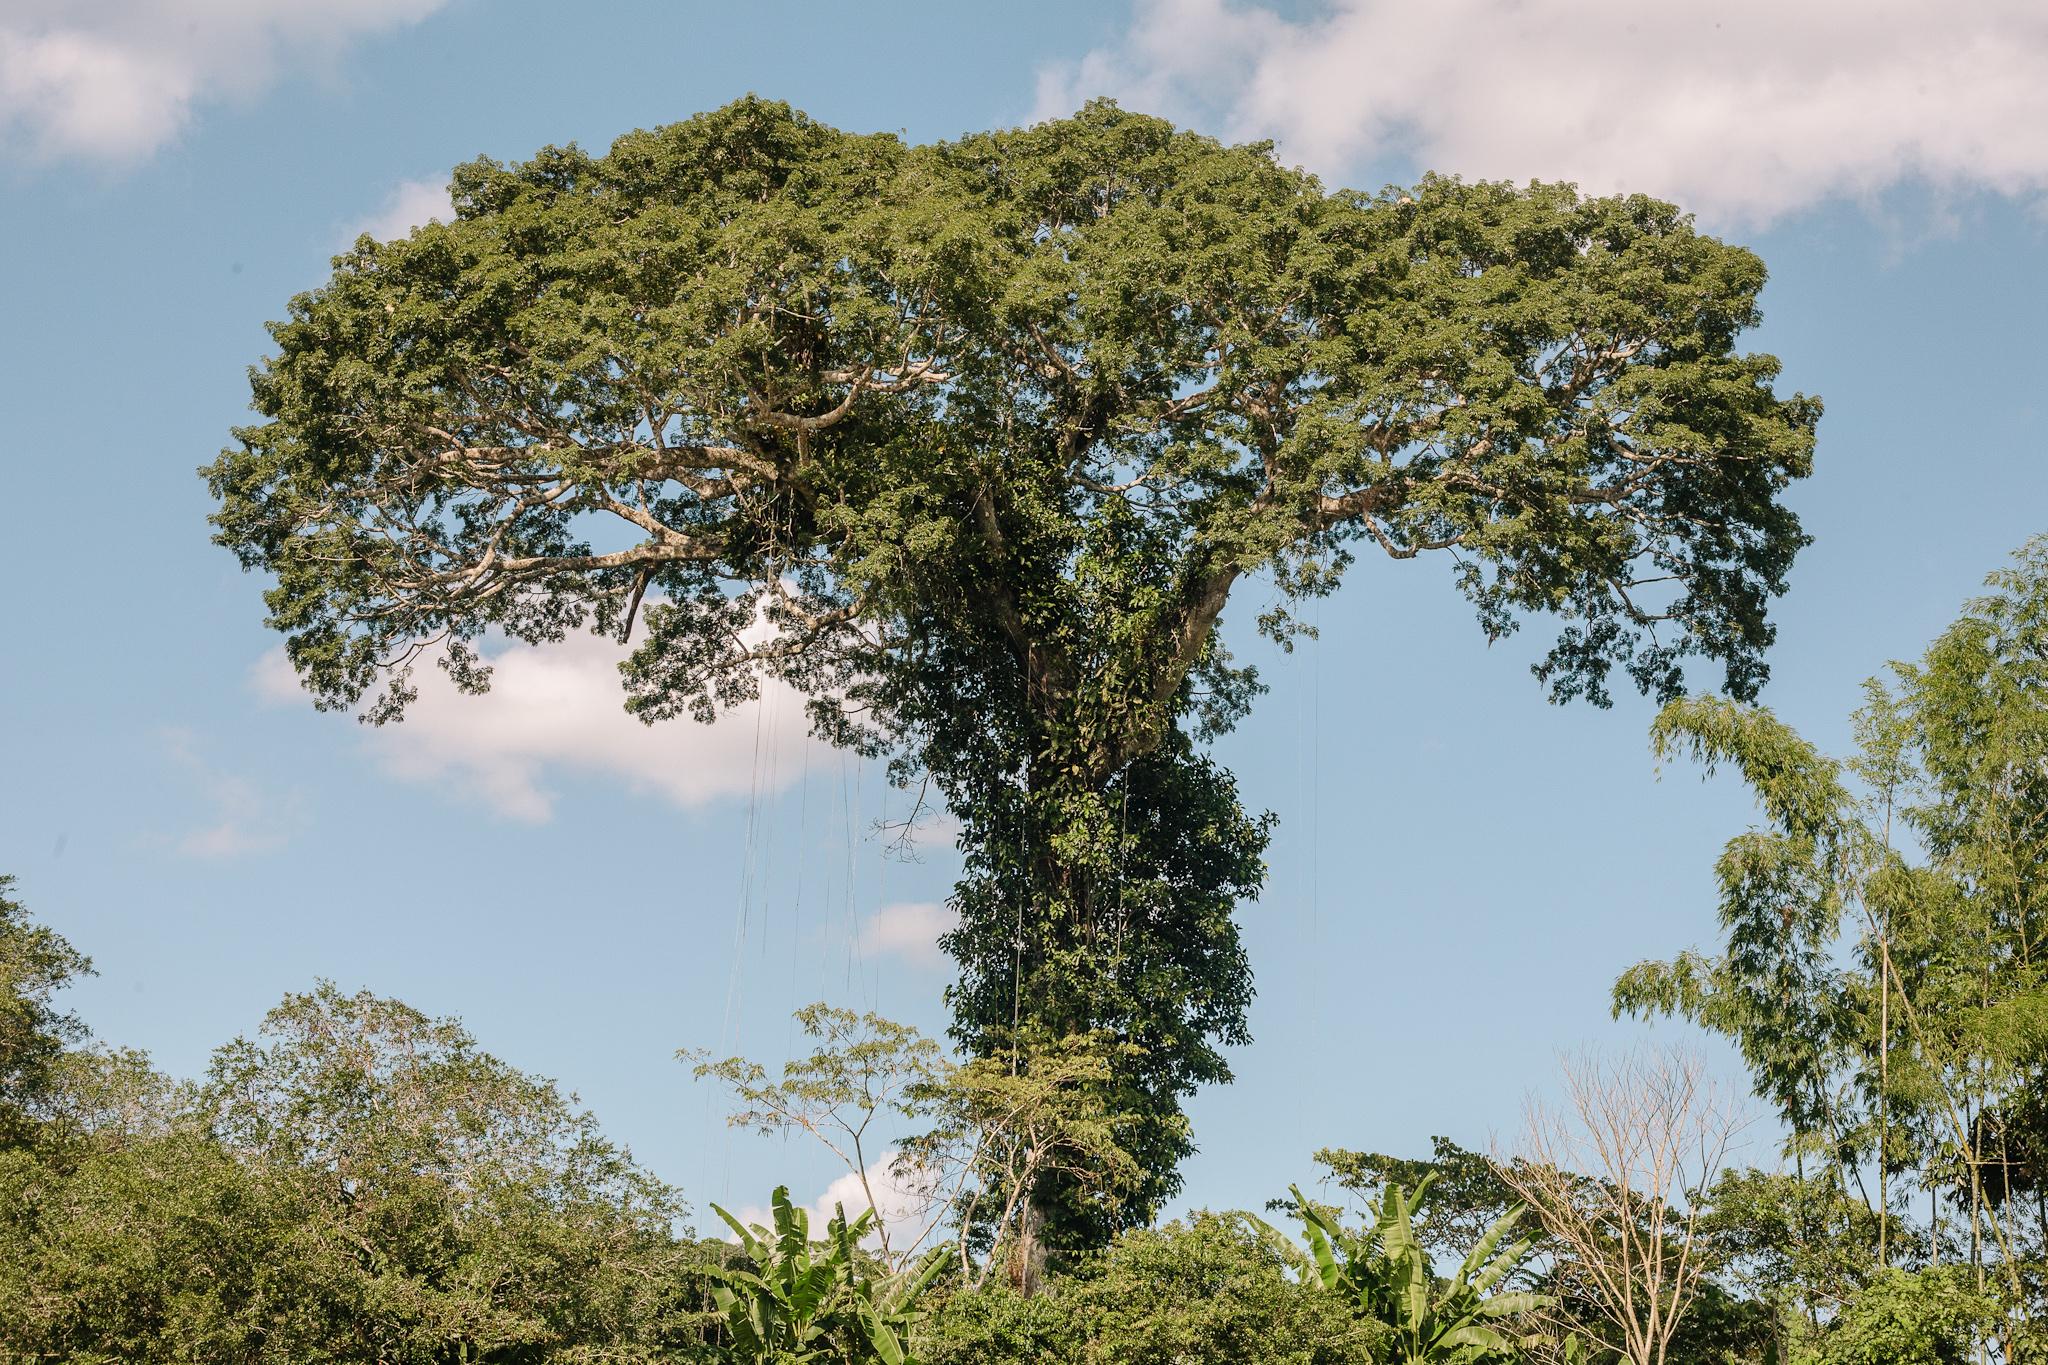 EcuadorQuito&Amazon_forwebsite2015_Jan2010_jenniferleahy-061.jpg